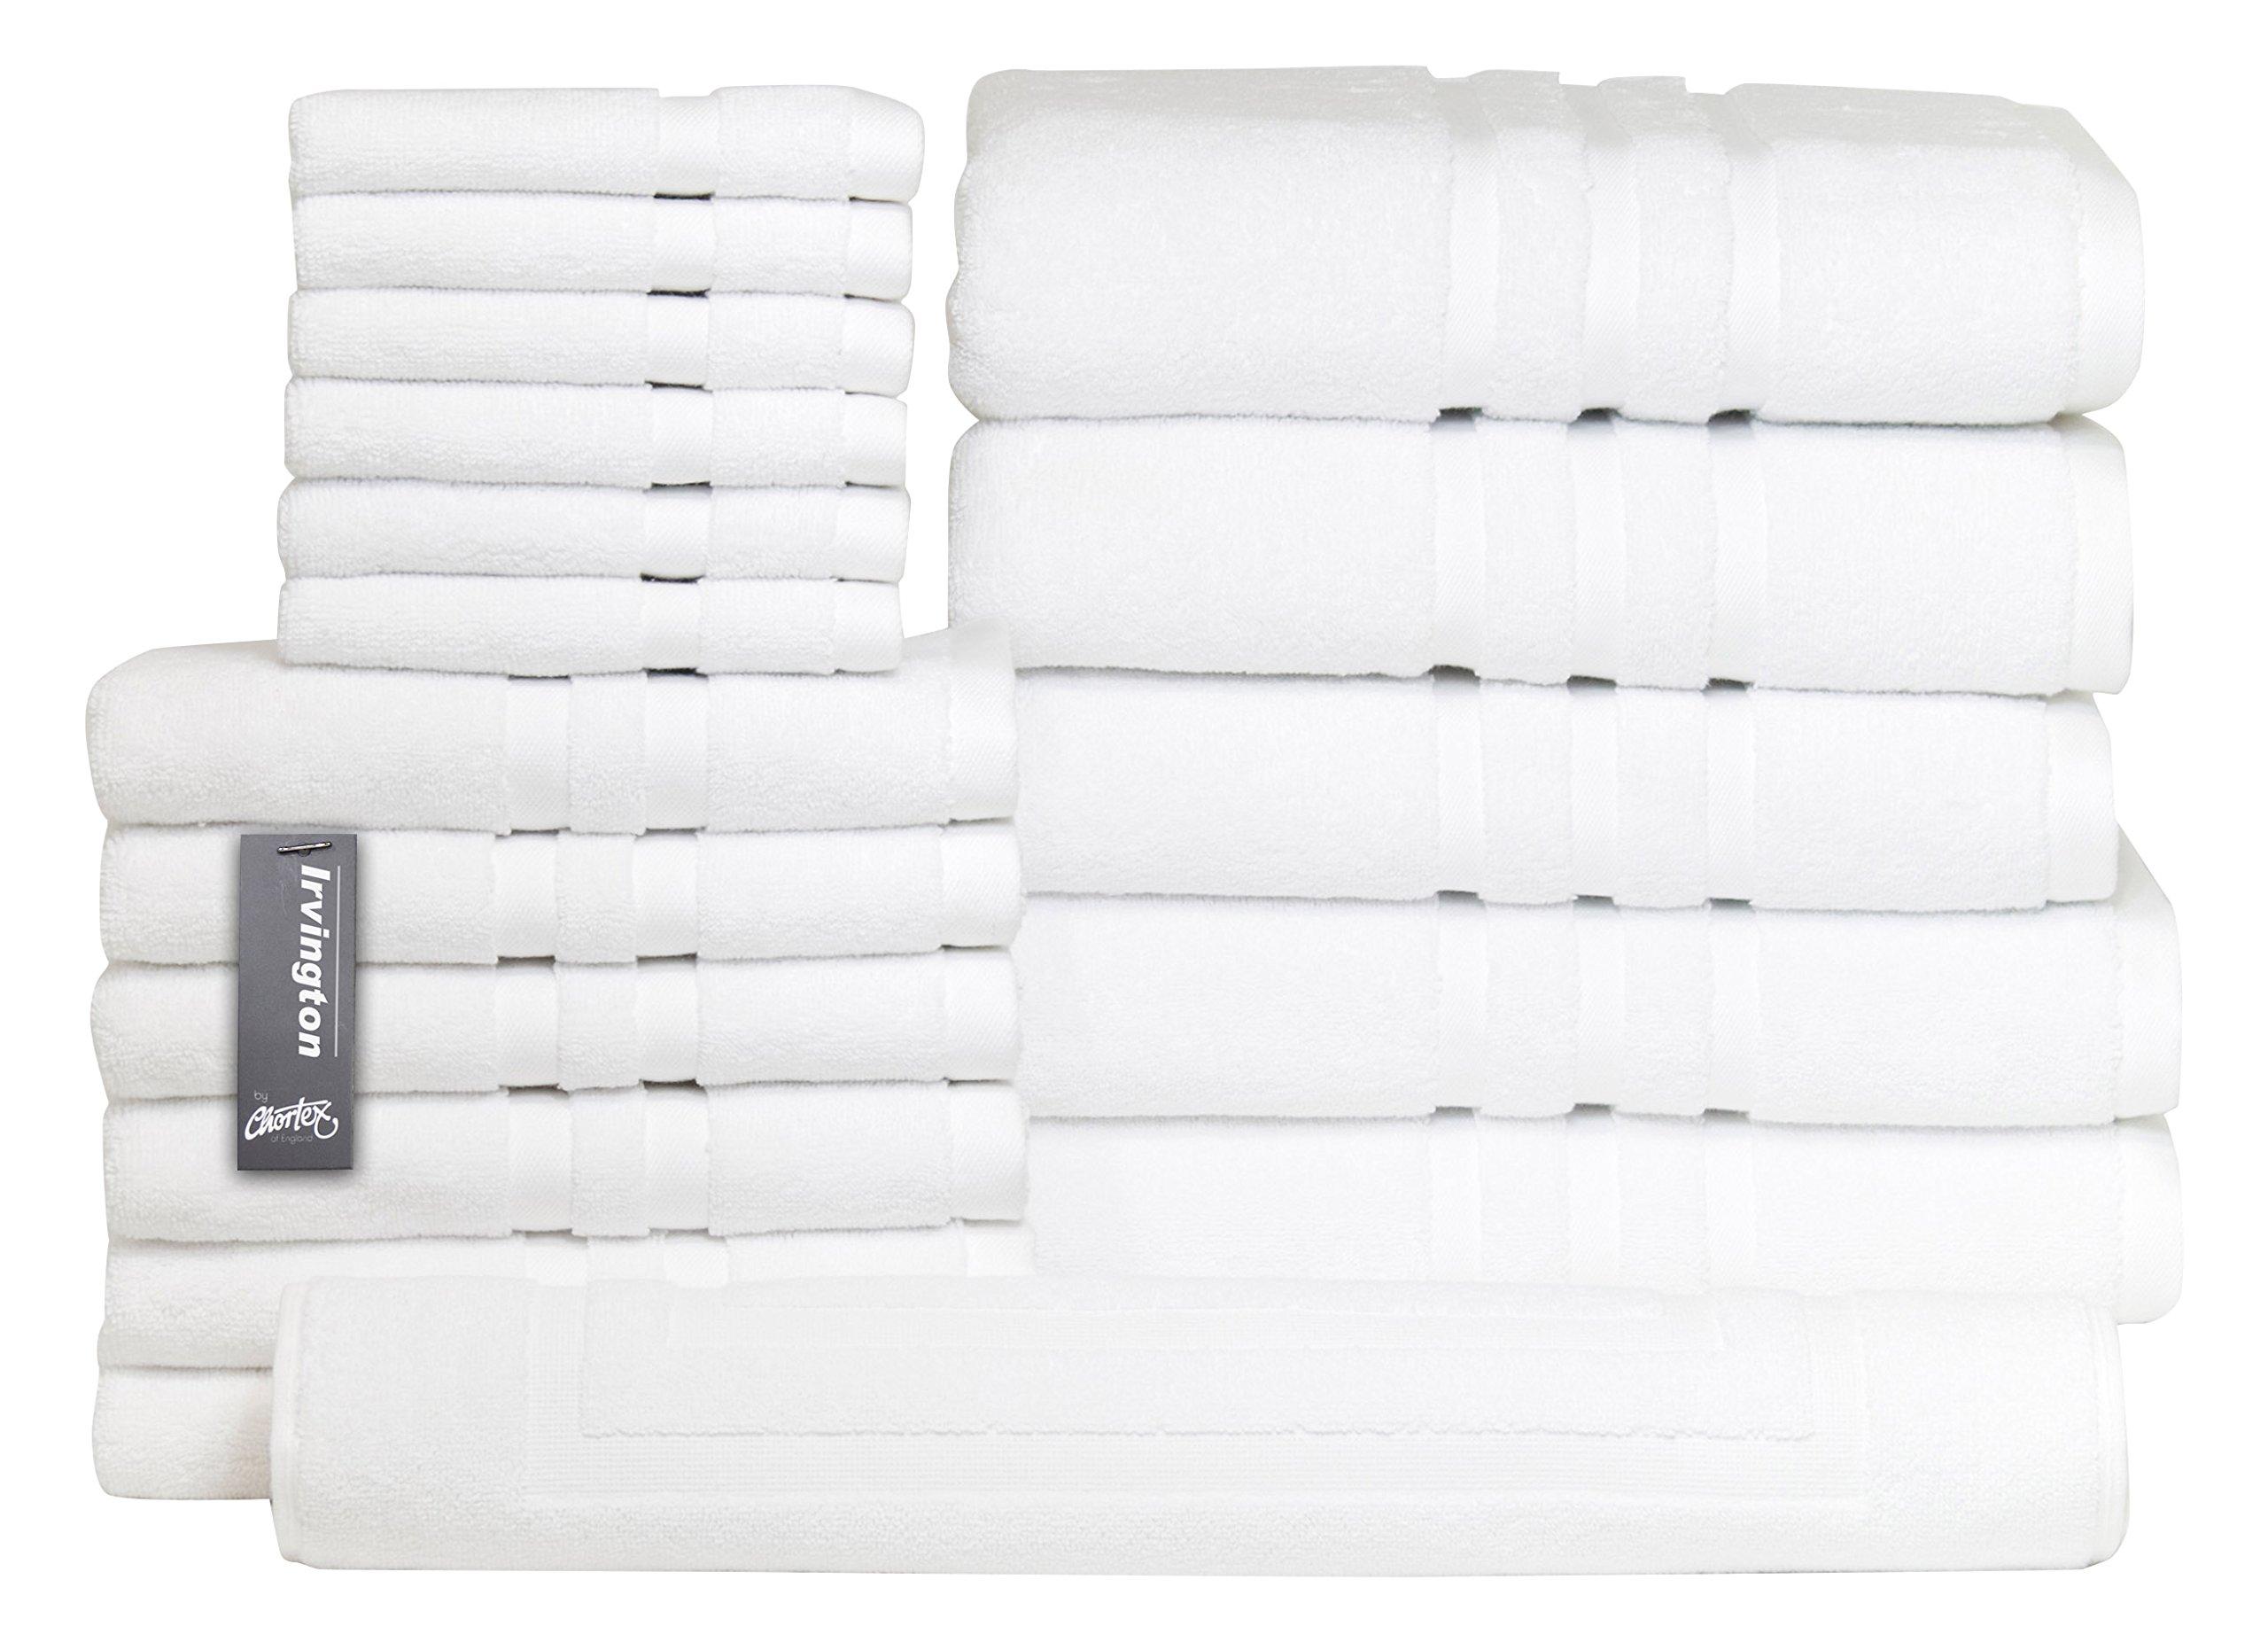 Chortex Luxury Turkish Cotton 18 Piece Towel Set Set of 18, White